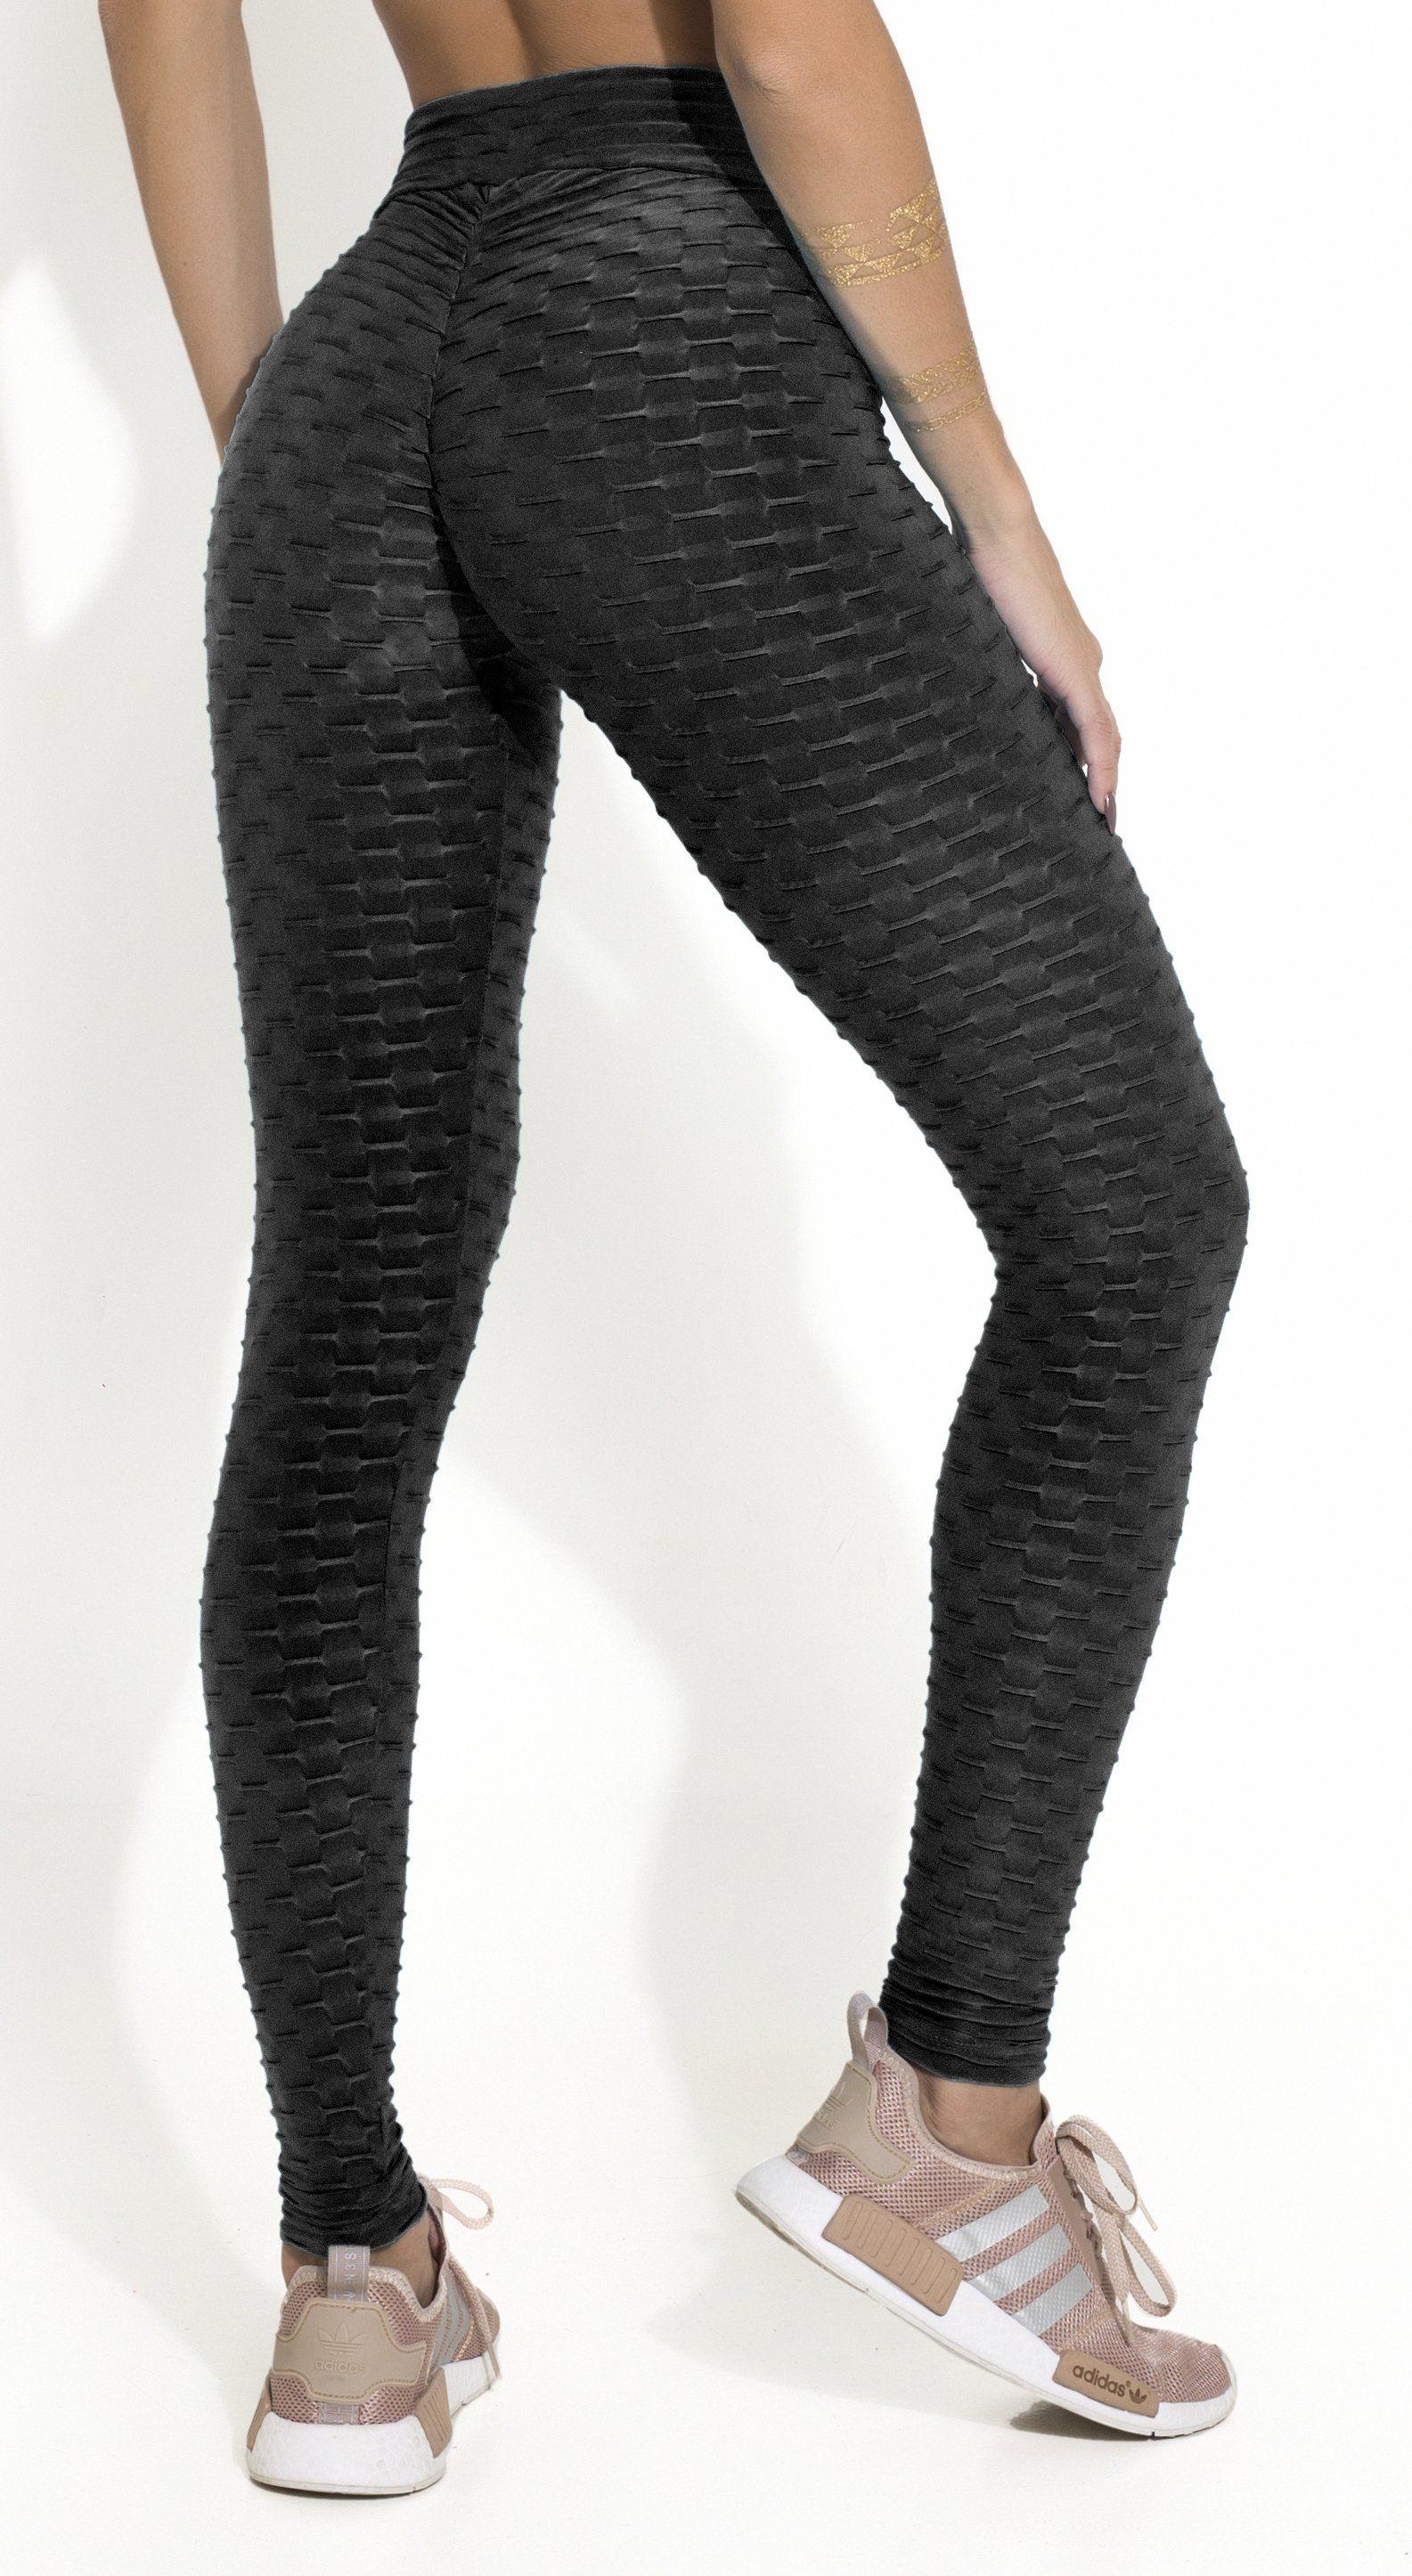 ff580ab9c61bc Brazilian Legging - Anti Cellulite Honeycomb Textured Scrunch Booty Shiny  Black